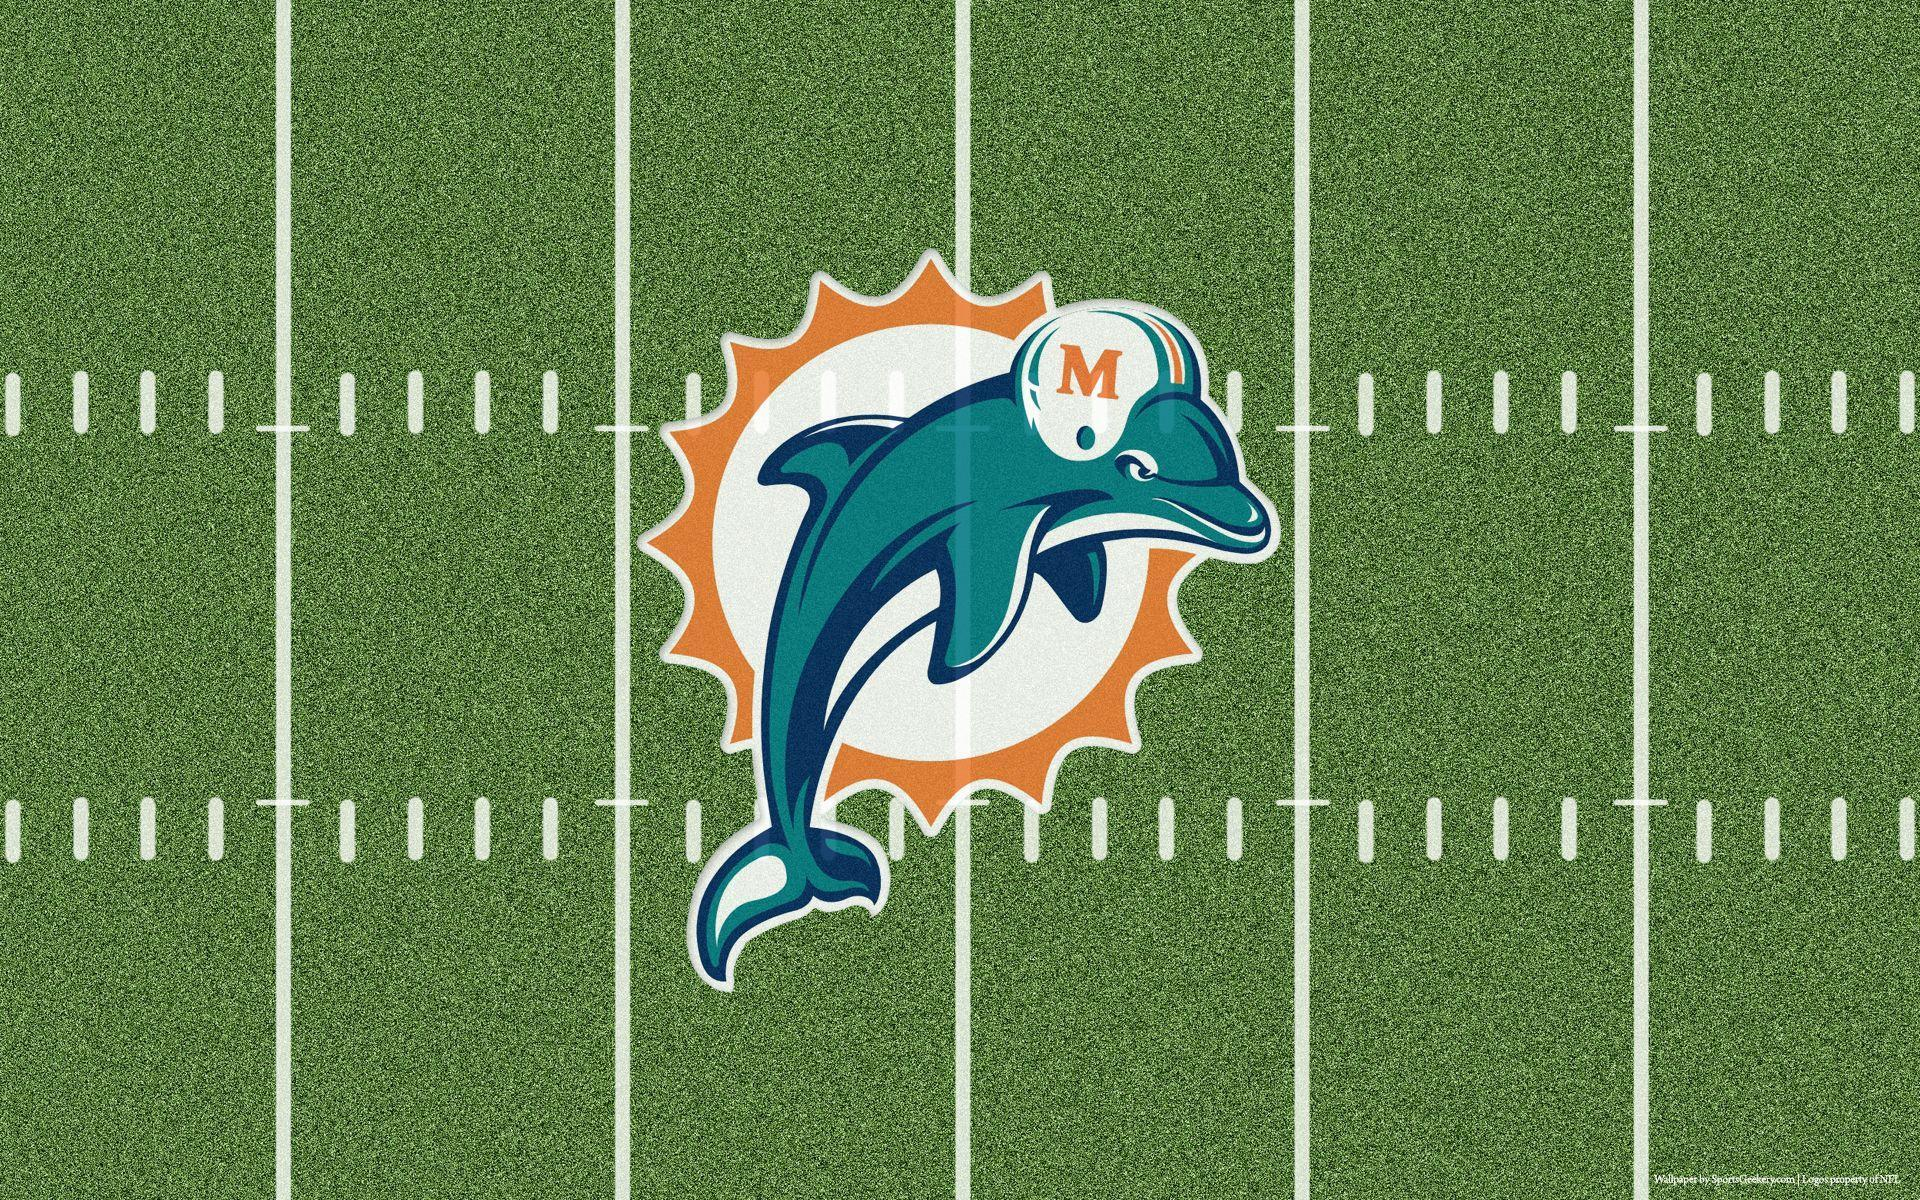 Free Miami Dolphins Wallpaper Screensavers - WallpaperSafari